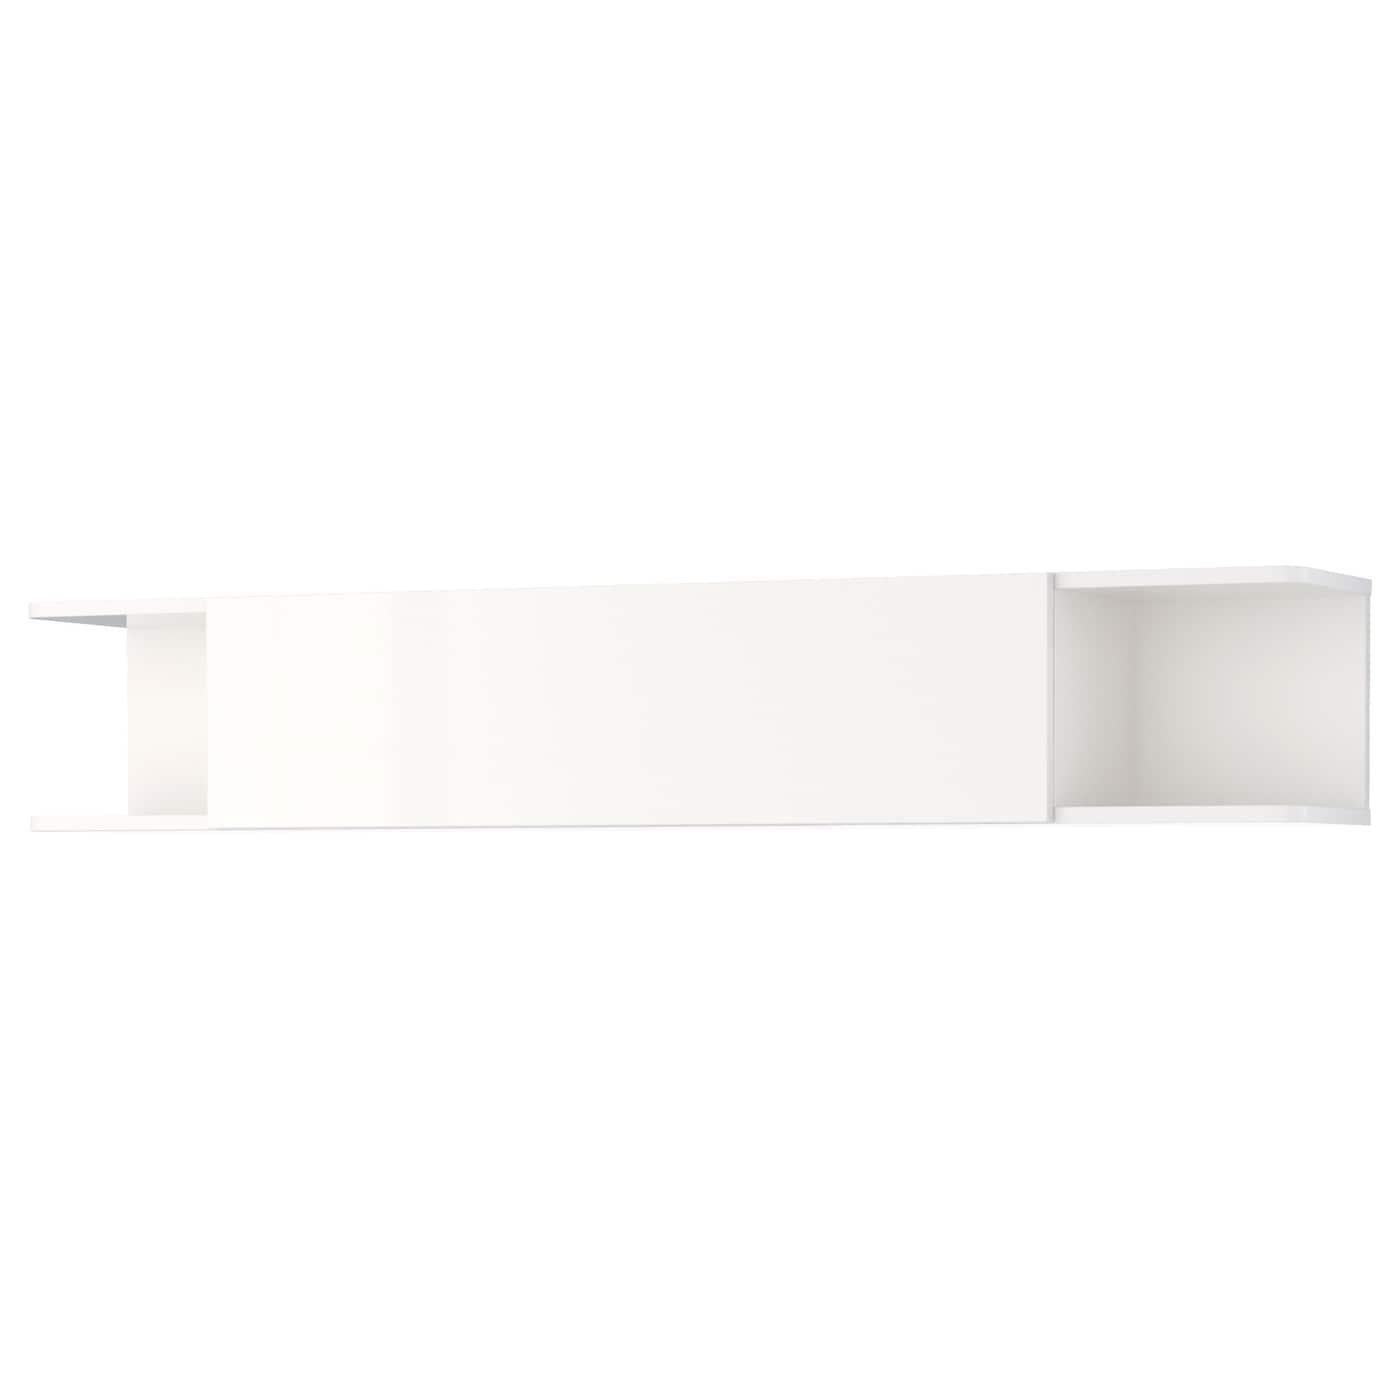 mostorp wall shelf high gloss white 160x27 cm ikea. Black Bedroom Furniture Sets. Home Design Ideas